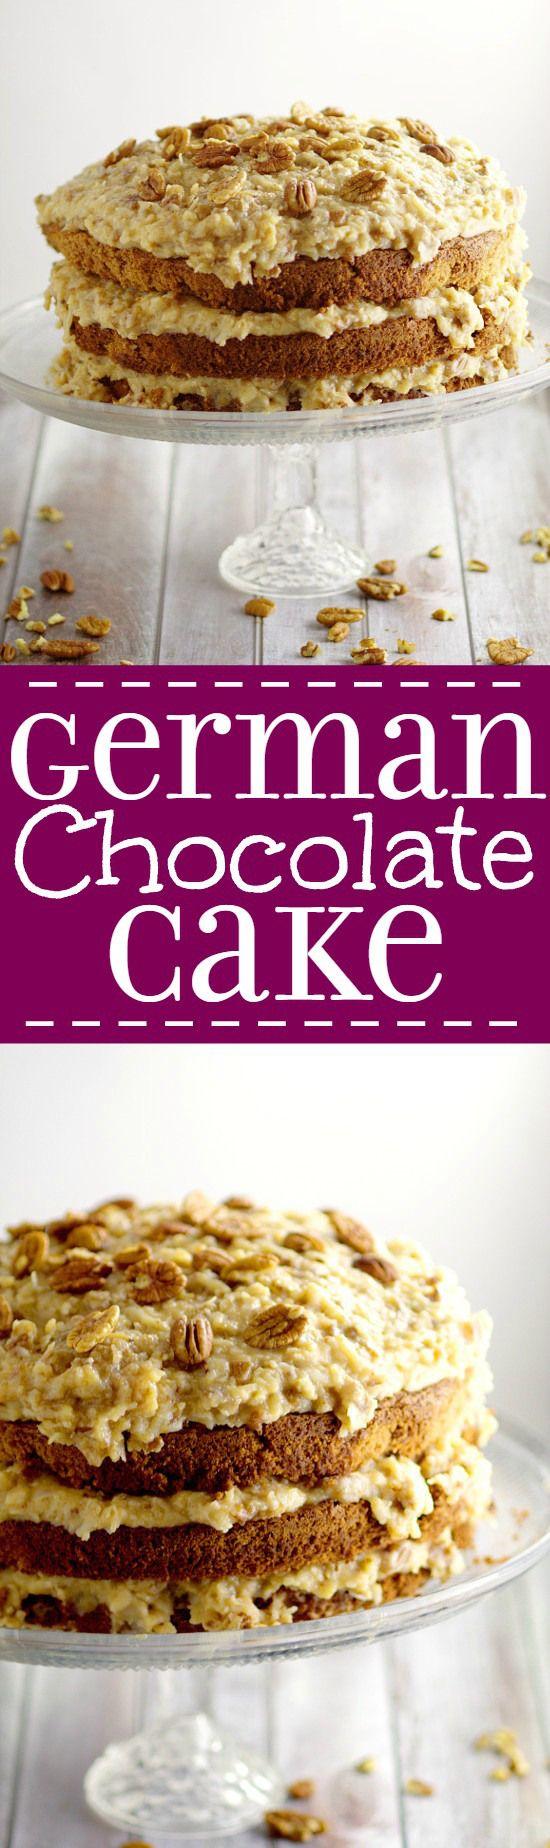 25+ best German chocolate frosting ideas on Pinterest | German ...